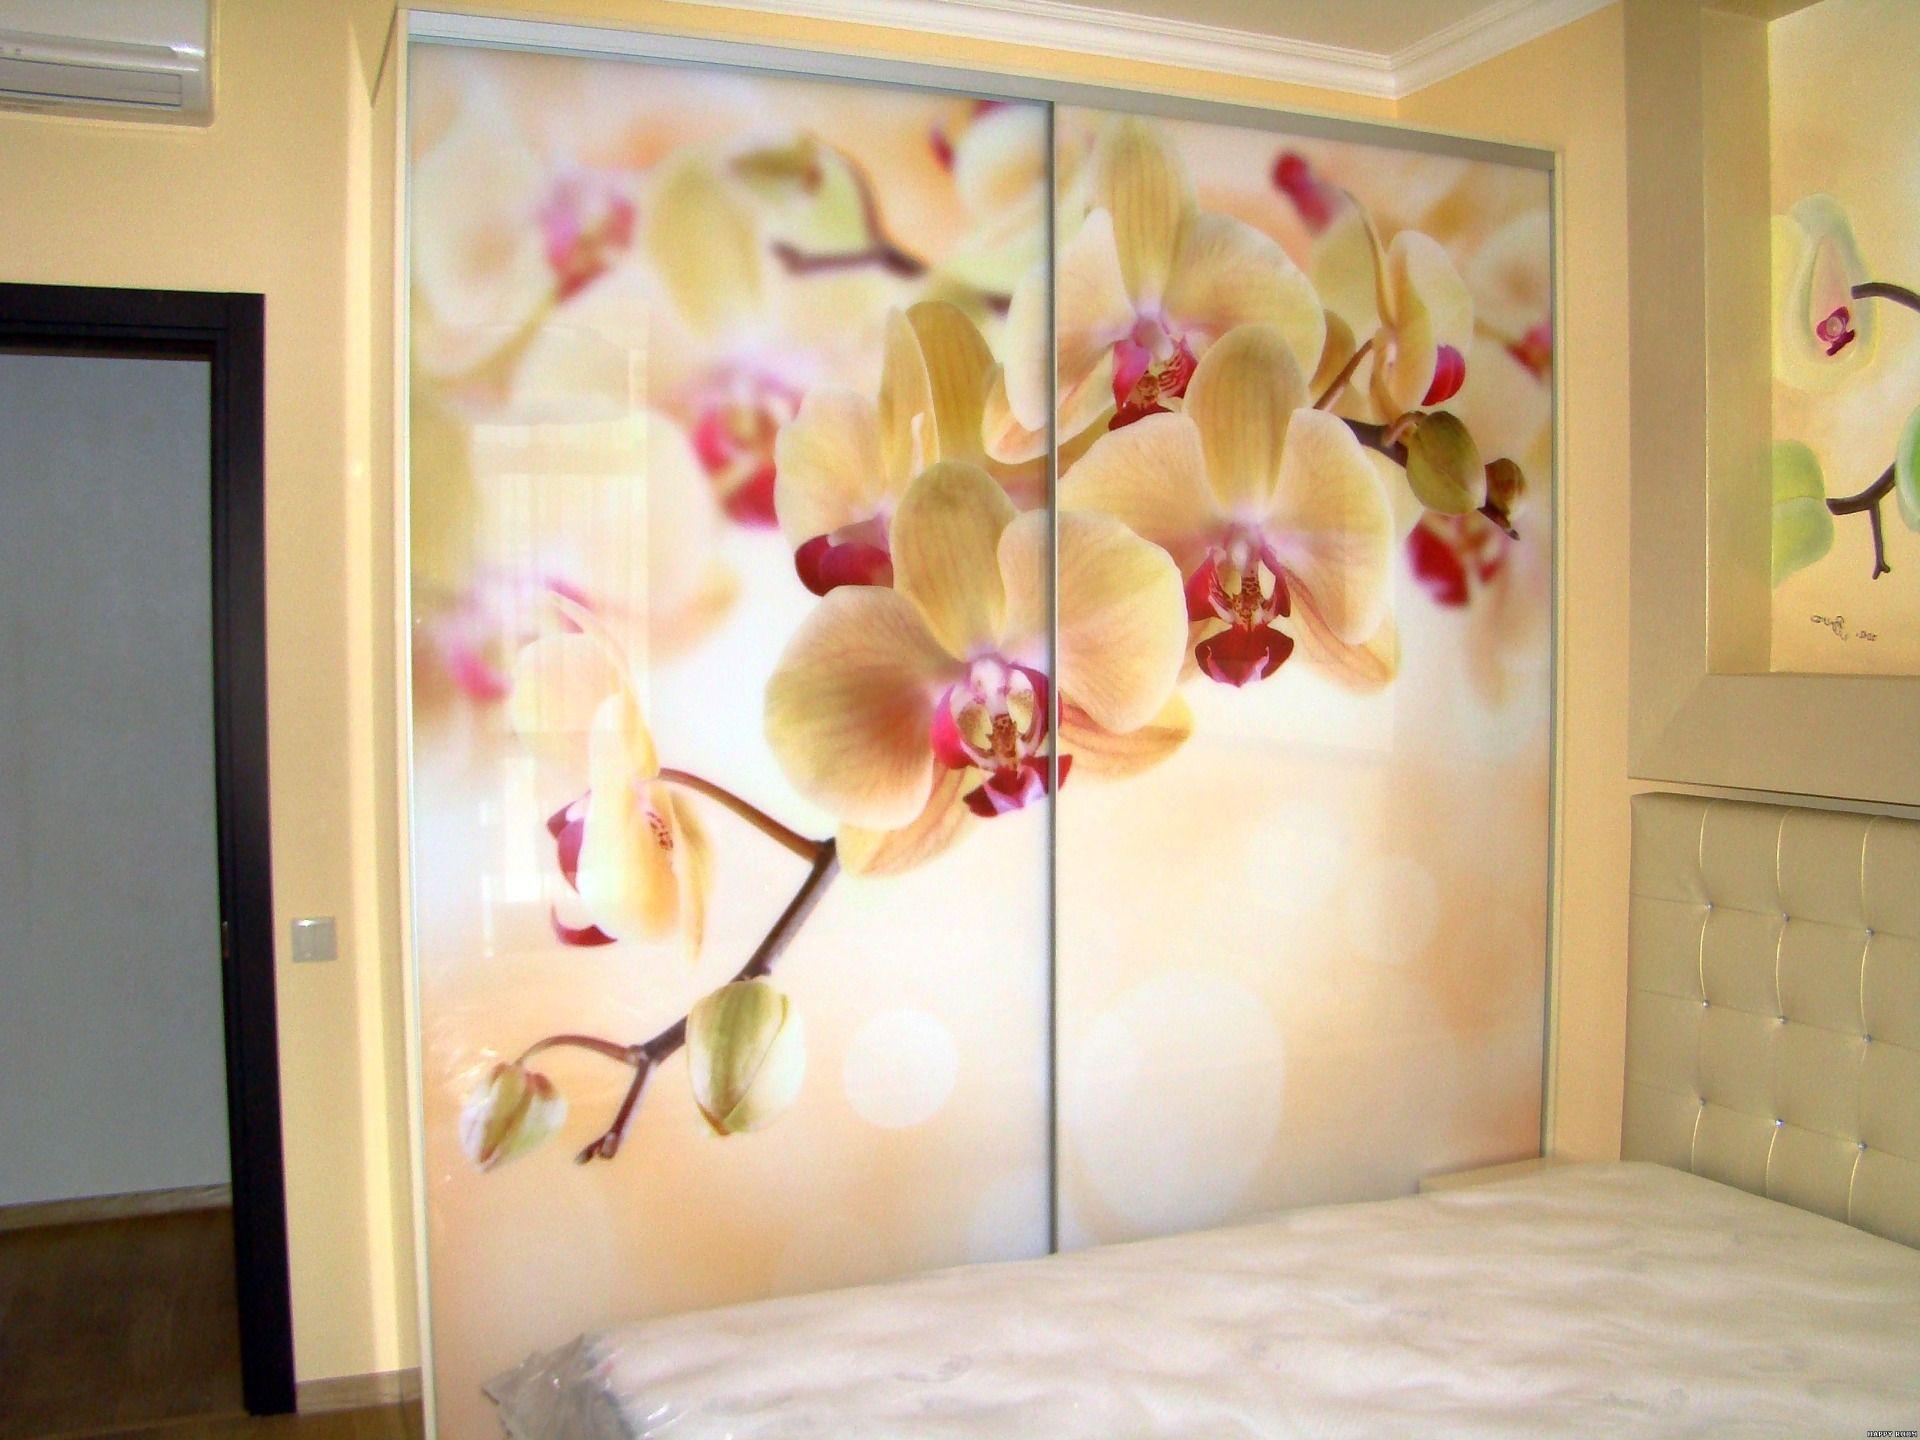 Bedroom Cupboard Flower Design - HD Wallpaper